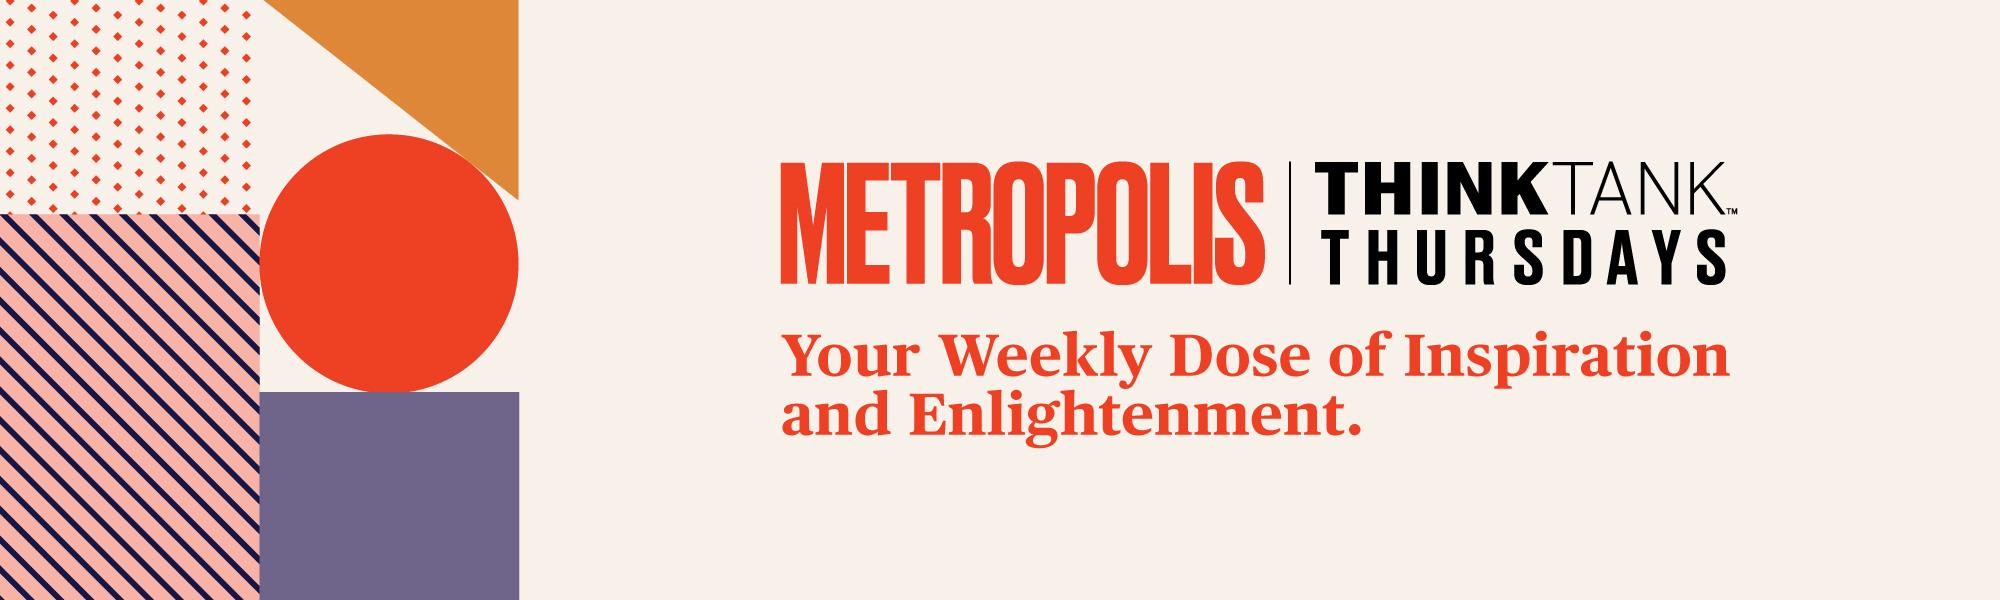 Metropolis Think Tank Thursdays